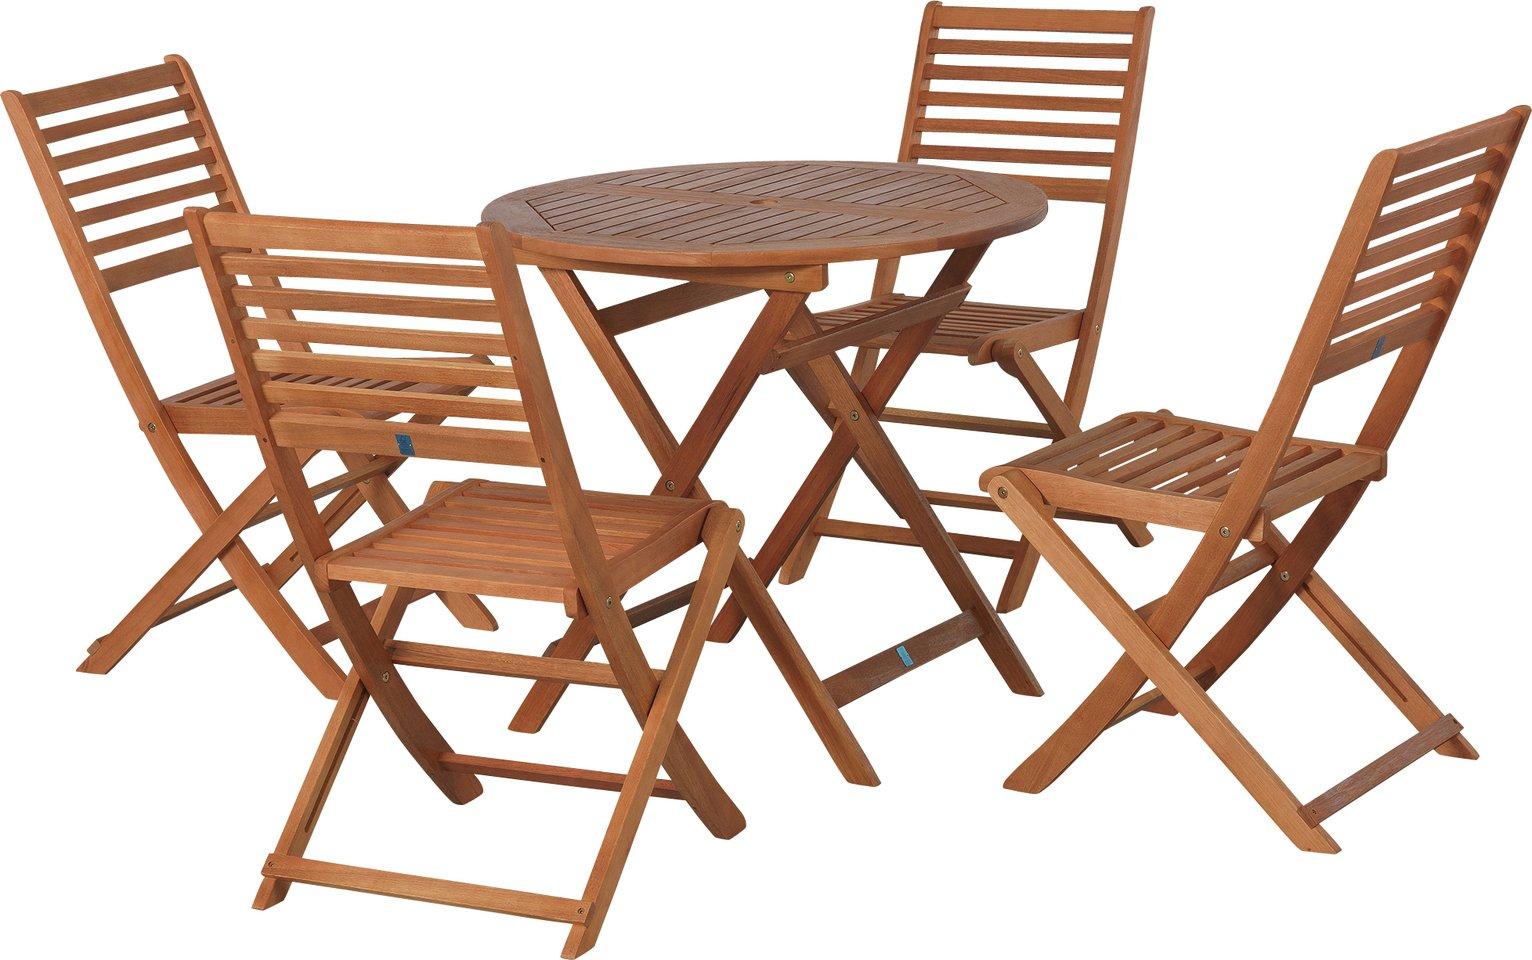 172 & Buy Argos Home Newbury 4 Seater Wooden Patio Set | Patio sets | Argos